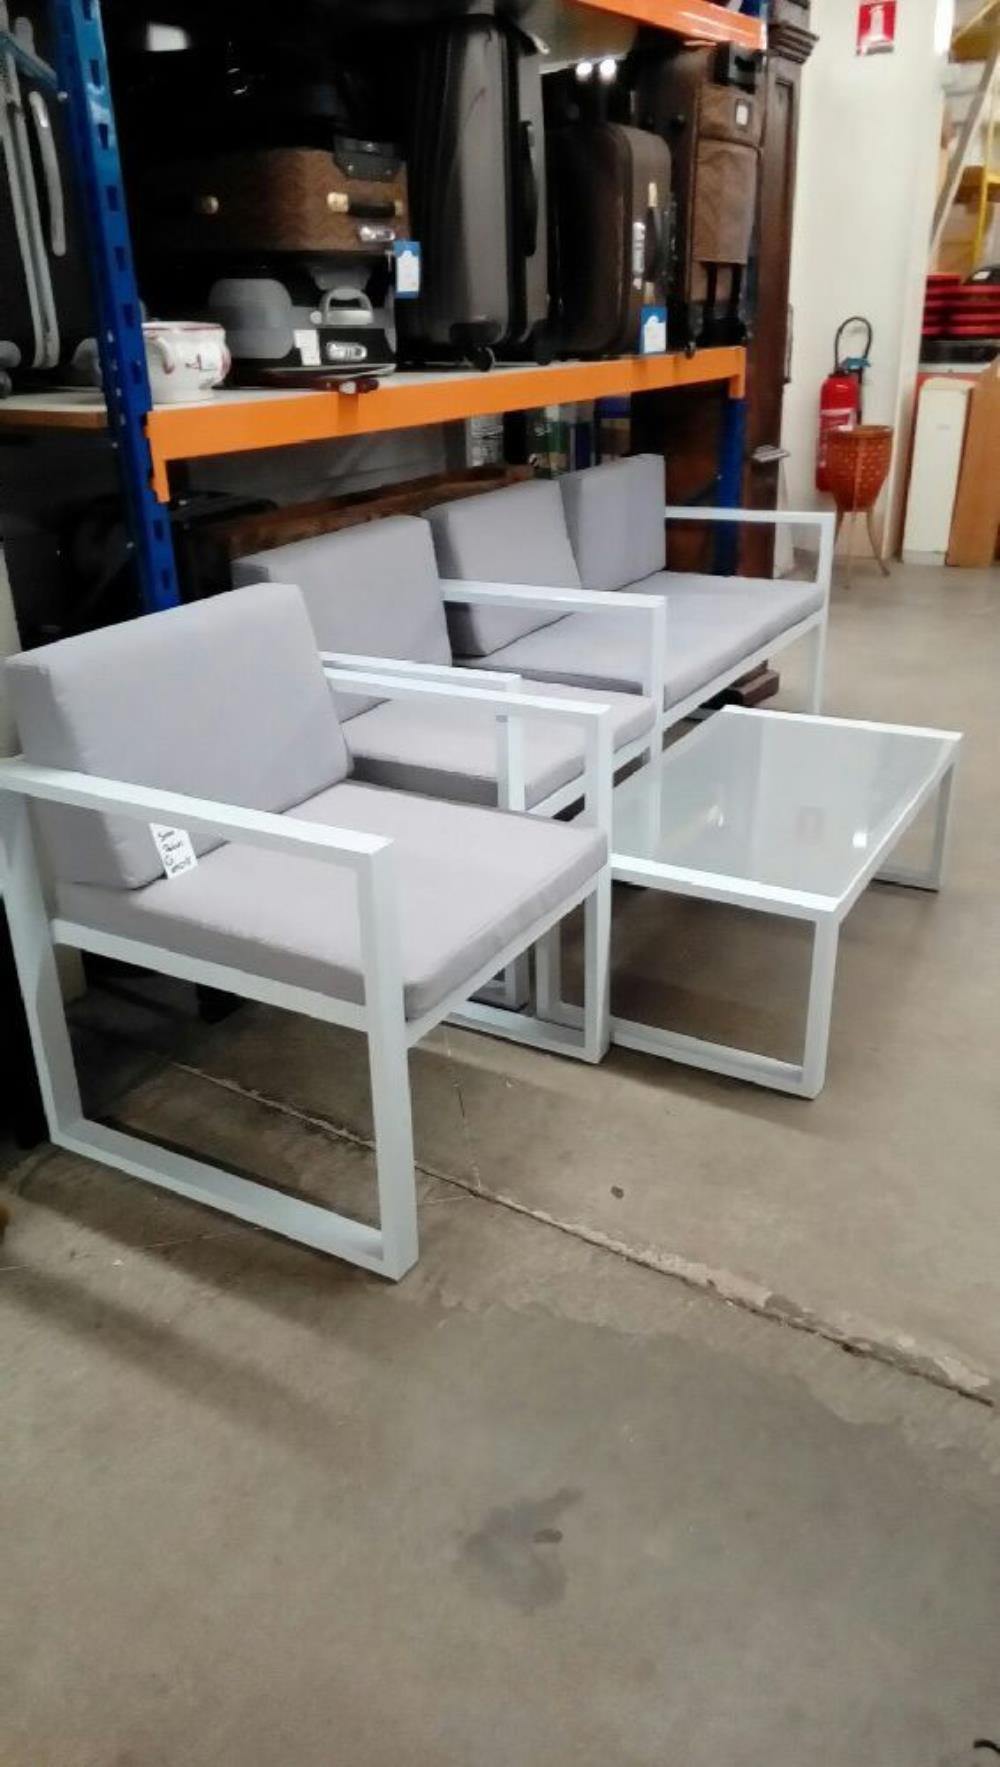 salon de jardin 86917 palaos 4elements occasion troc nancy. Black Bedroom Furniture Sets. Home Design Ideas